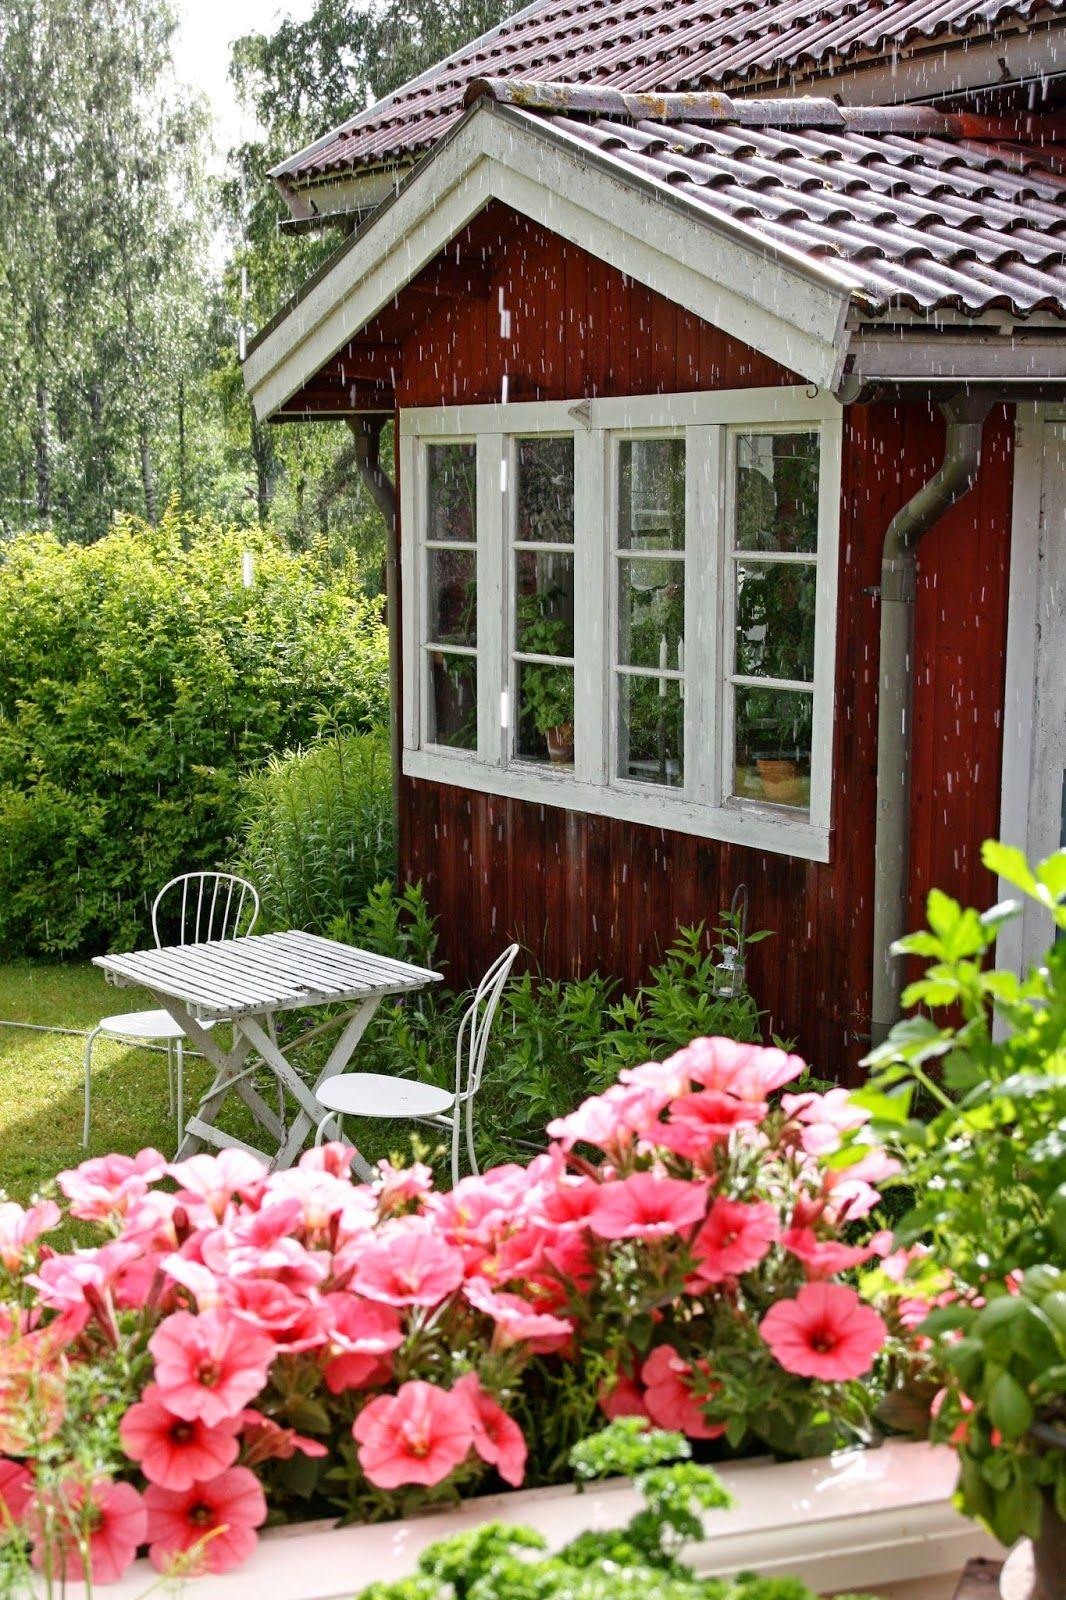 nordingården | Kesämökki - Sommarstuga - Cottage | Pinterest ...